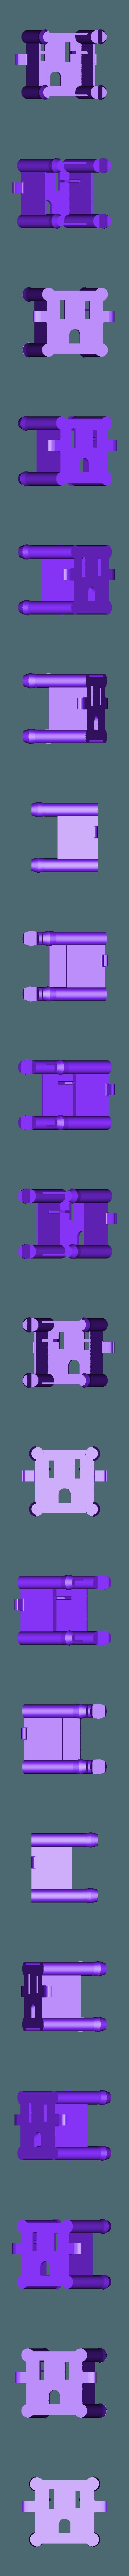 AC_adapter2organizer.stl Download free STL file AC Adapter Organizer • 3D printer design, Obenottr3D